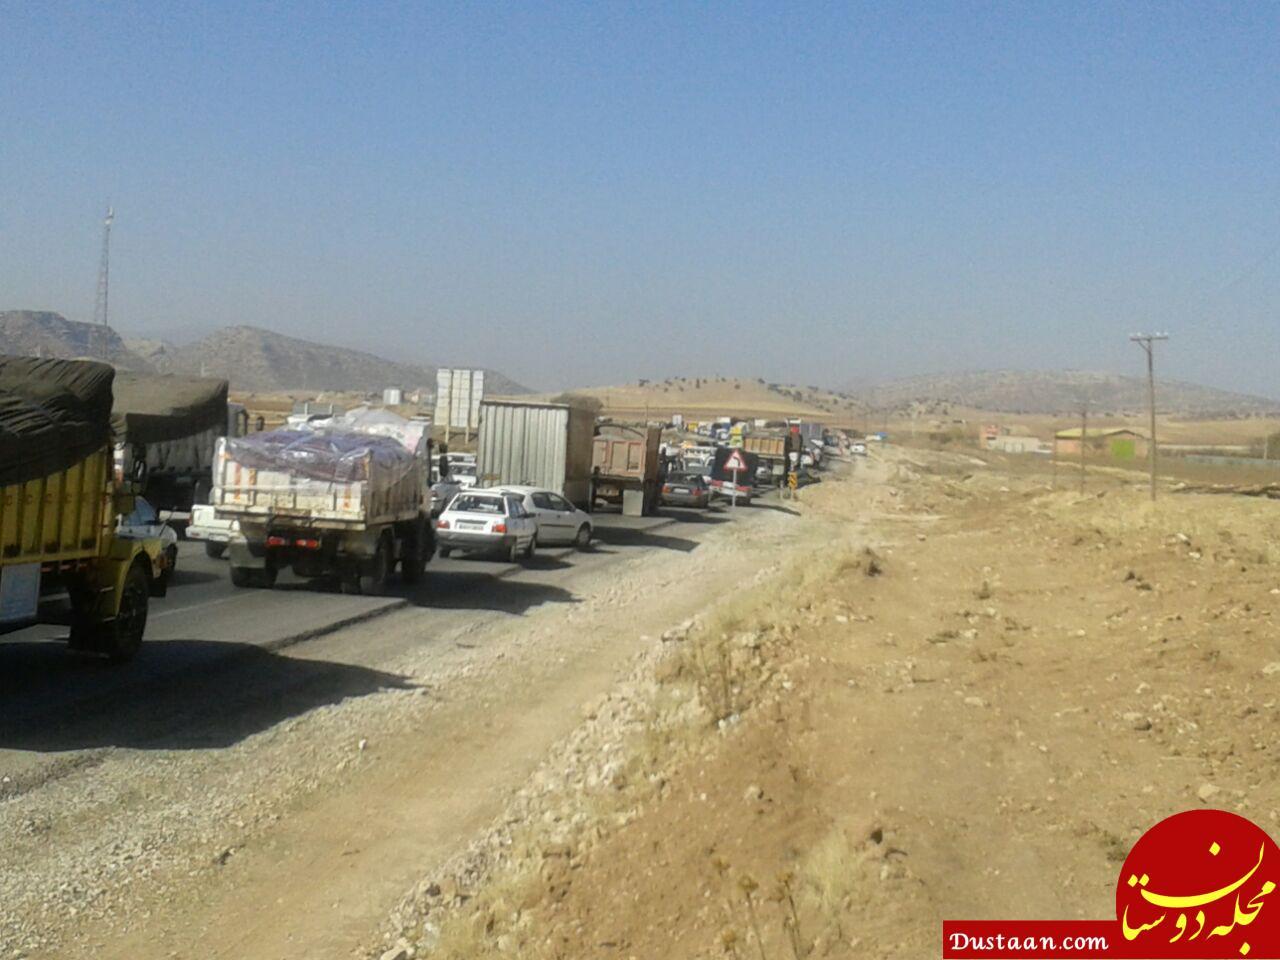 www.dustaan.com ترافیک سنگین در محور اسلام آباد غرب به طرف سرپل ذهاب +عکس